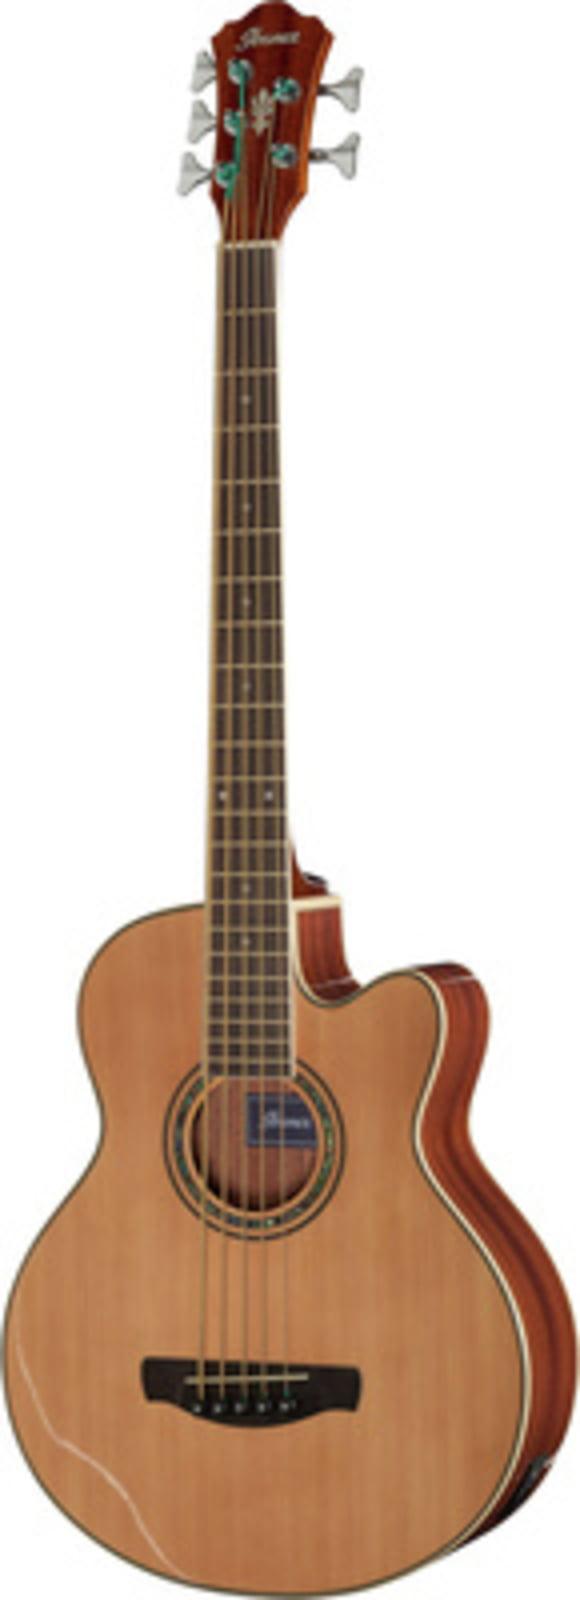 AEB105E-NT Acoustic Bass Ibanez